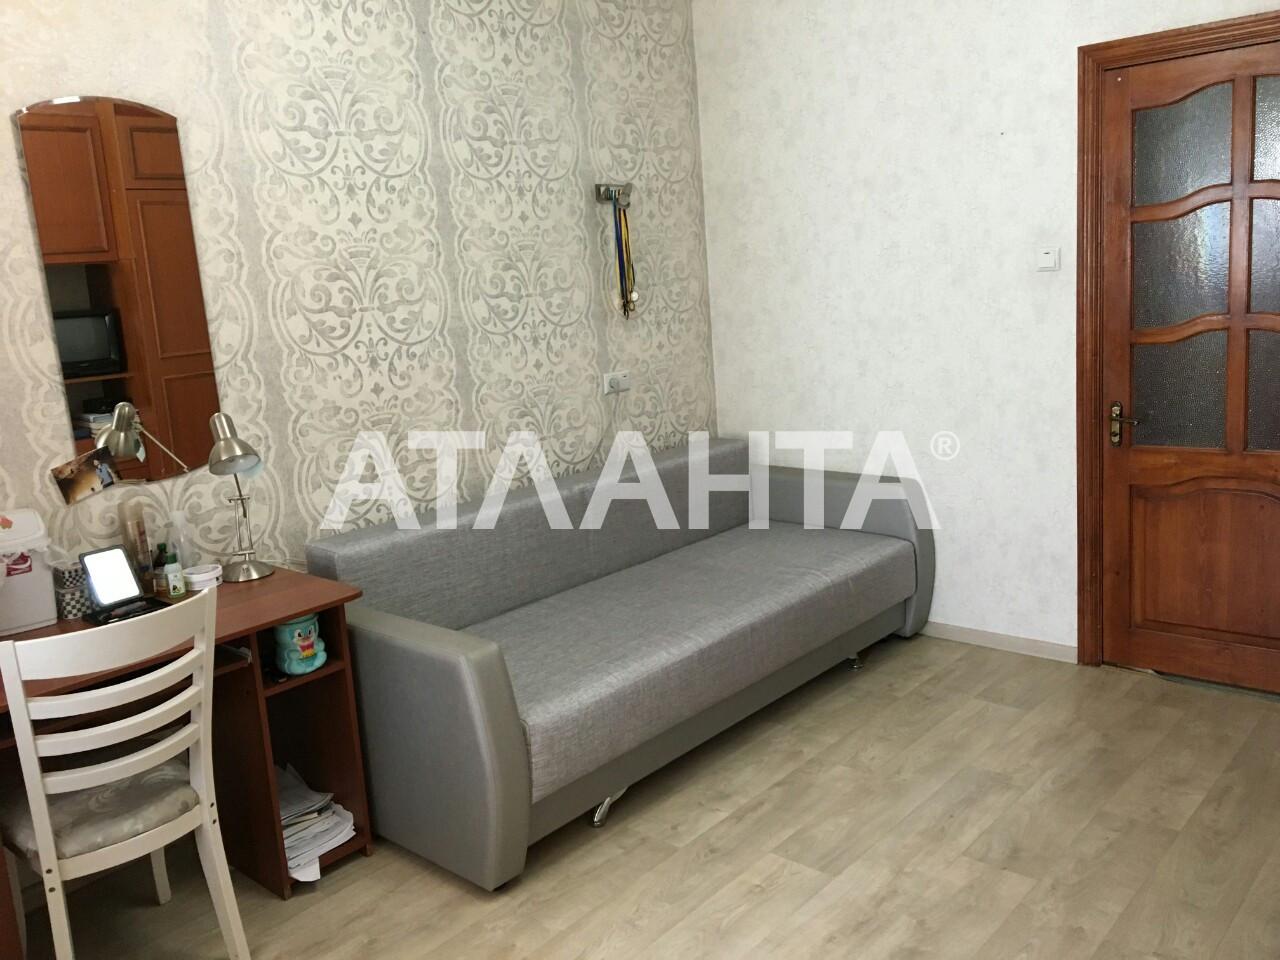 Продается 3-комнатная Квартира на ул. Архитекторская — 49 000 у.е. (фото №4)